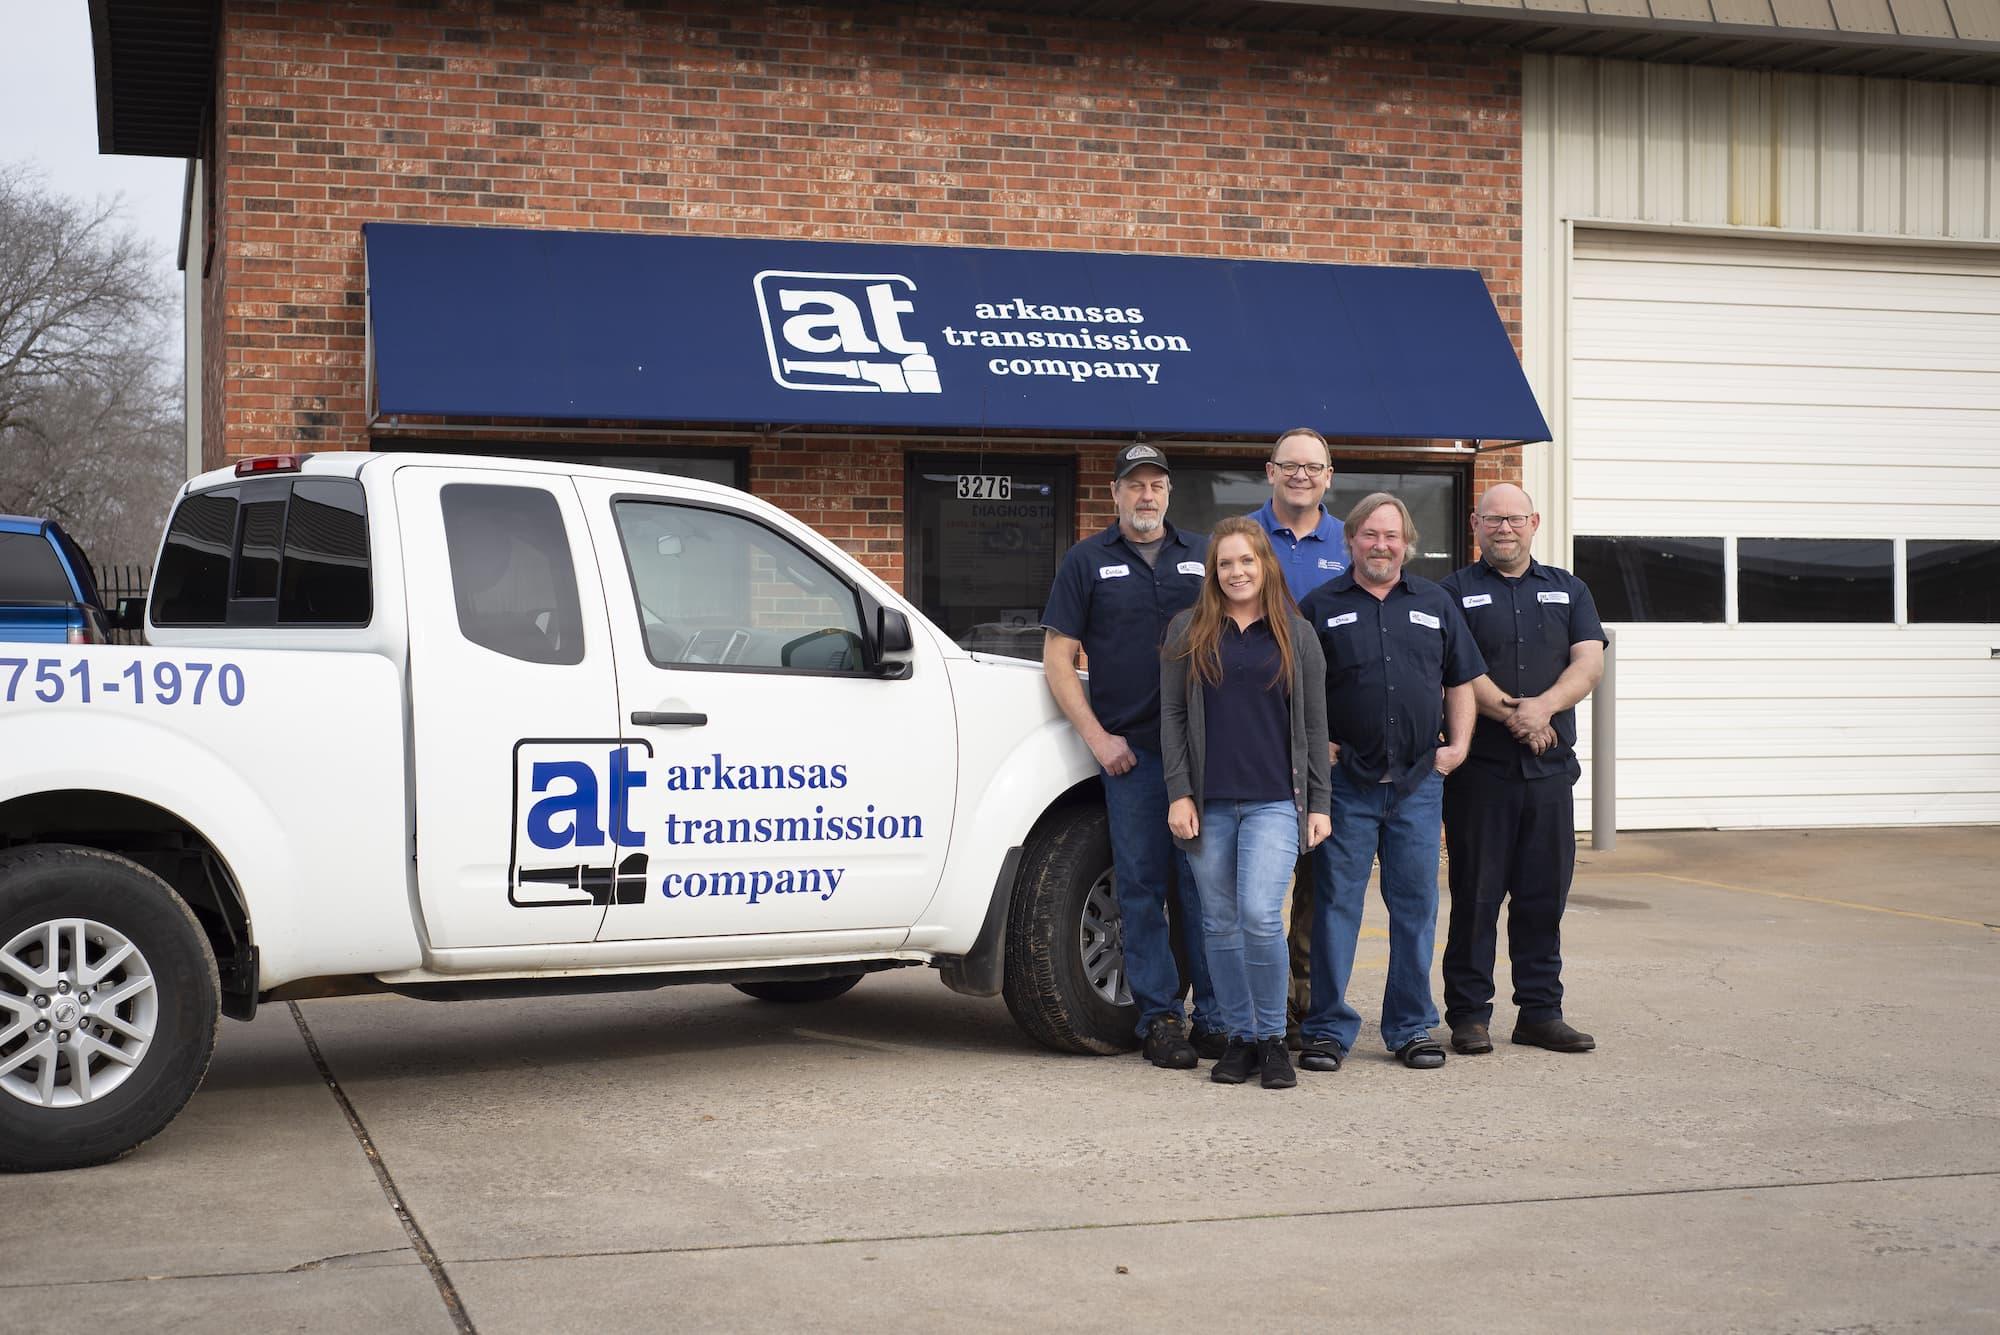 Arkansas Transmission store front.